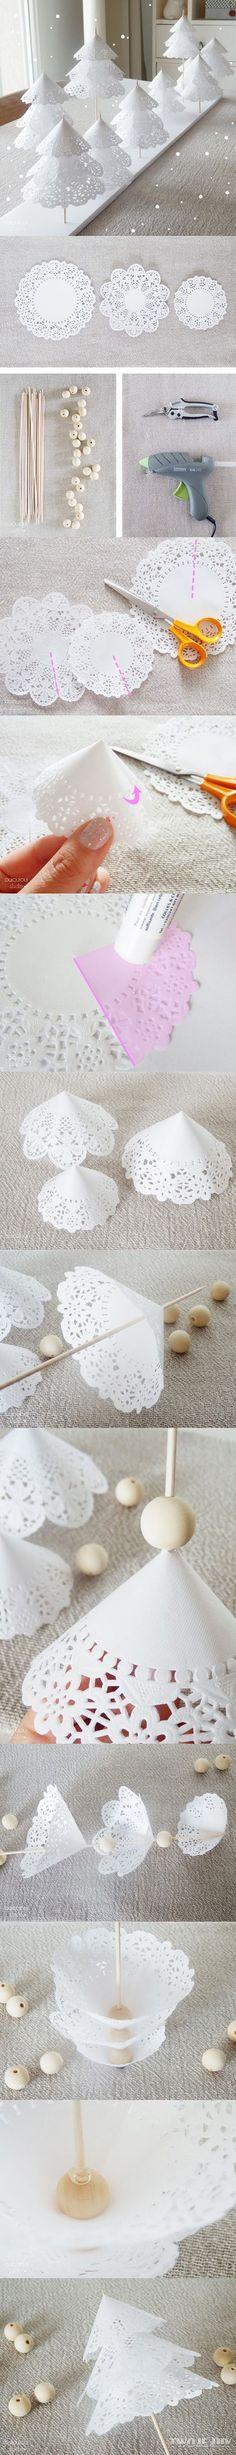 Mini-sapins de Noël DIY avec des napperons de papier